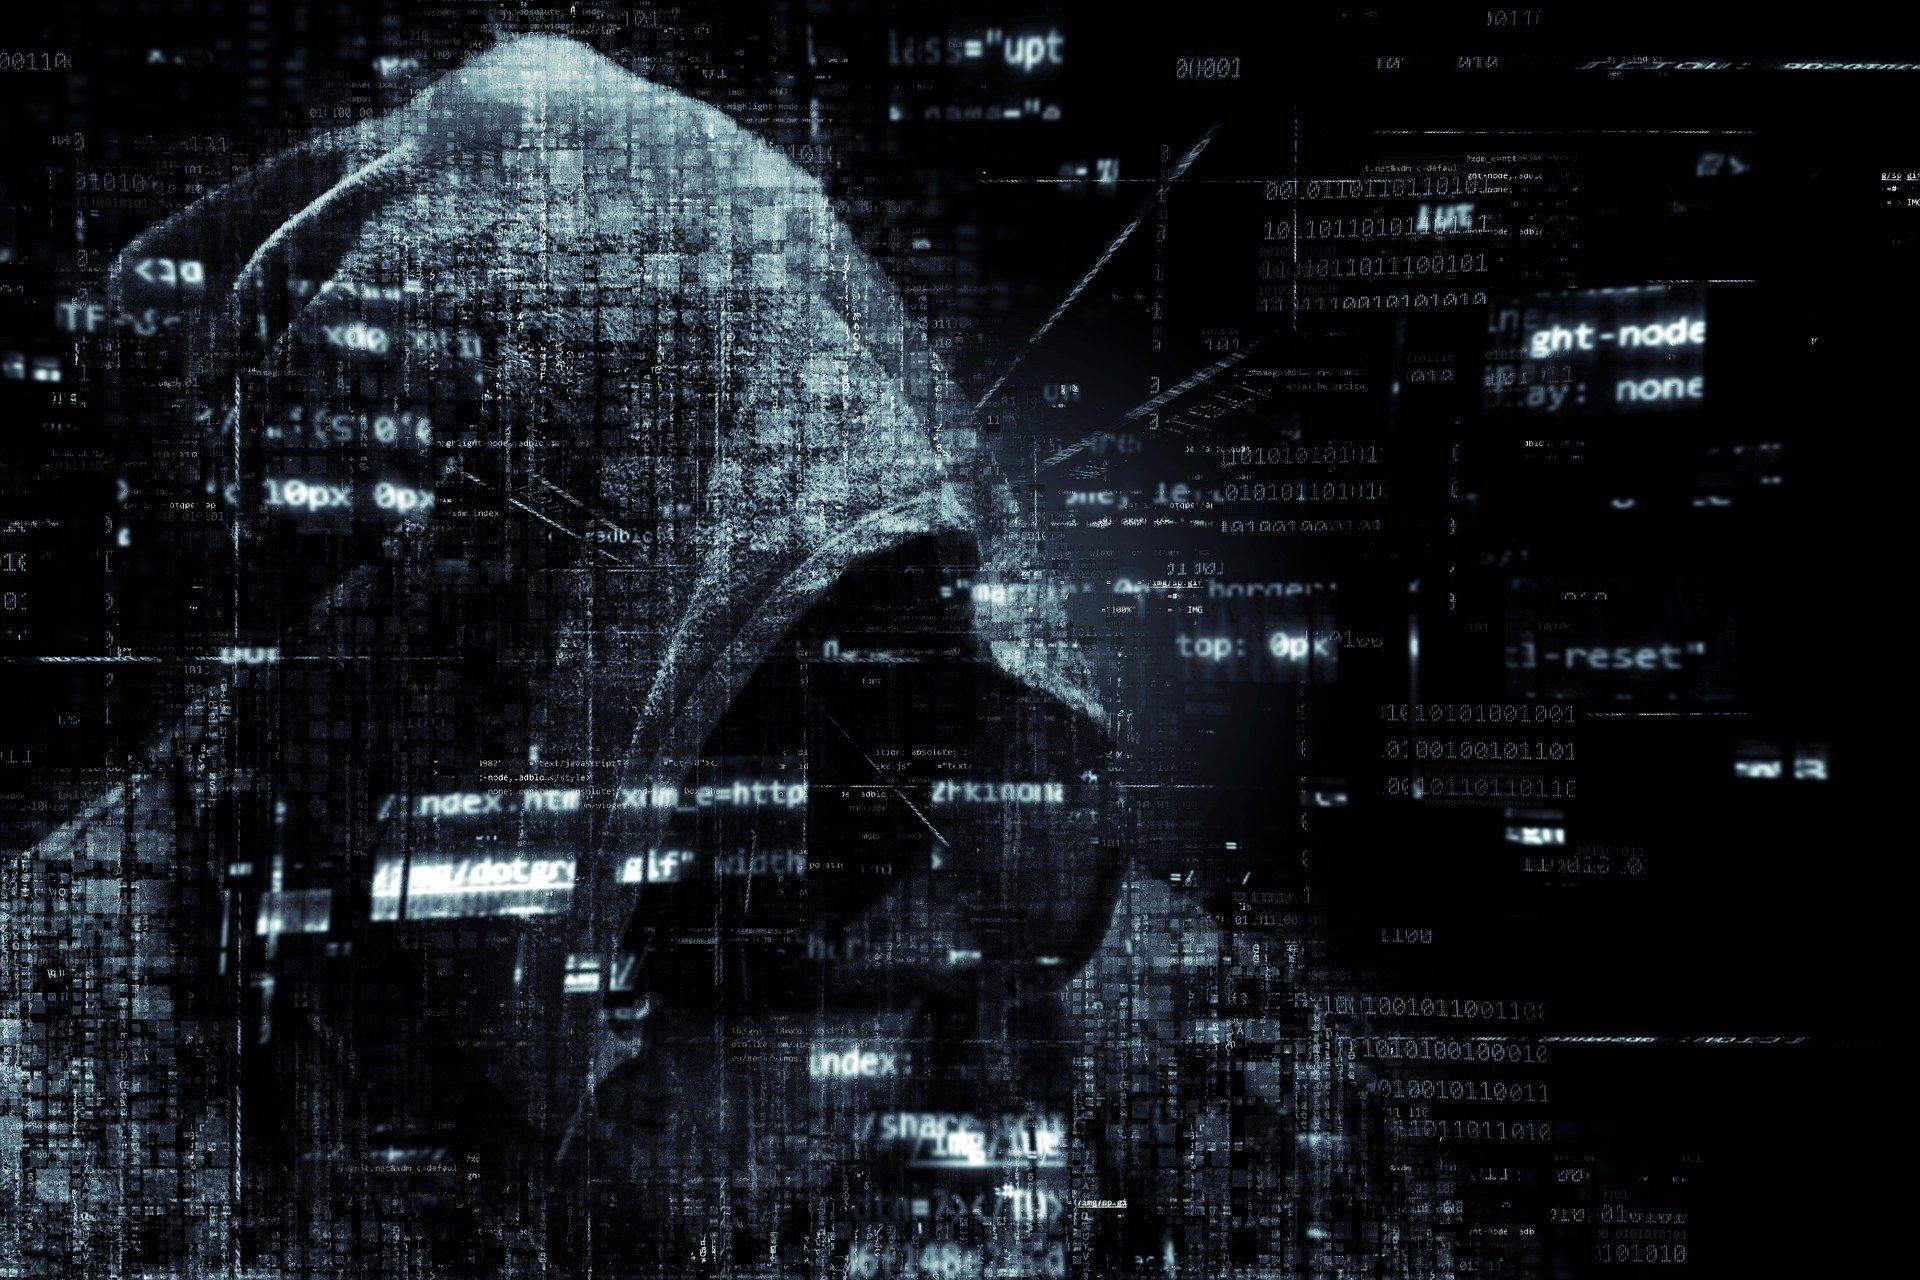 Intercambio de criptomonedas KuCoin sufre hackeo millonario en fondos principalmente de Bitcoin, Ether y tokens ERC-20